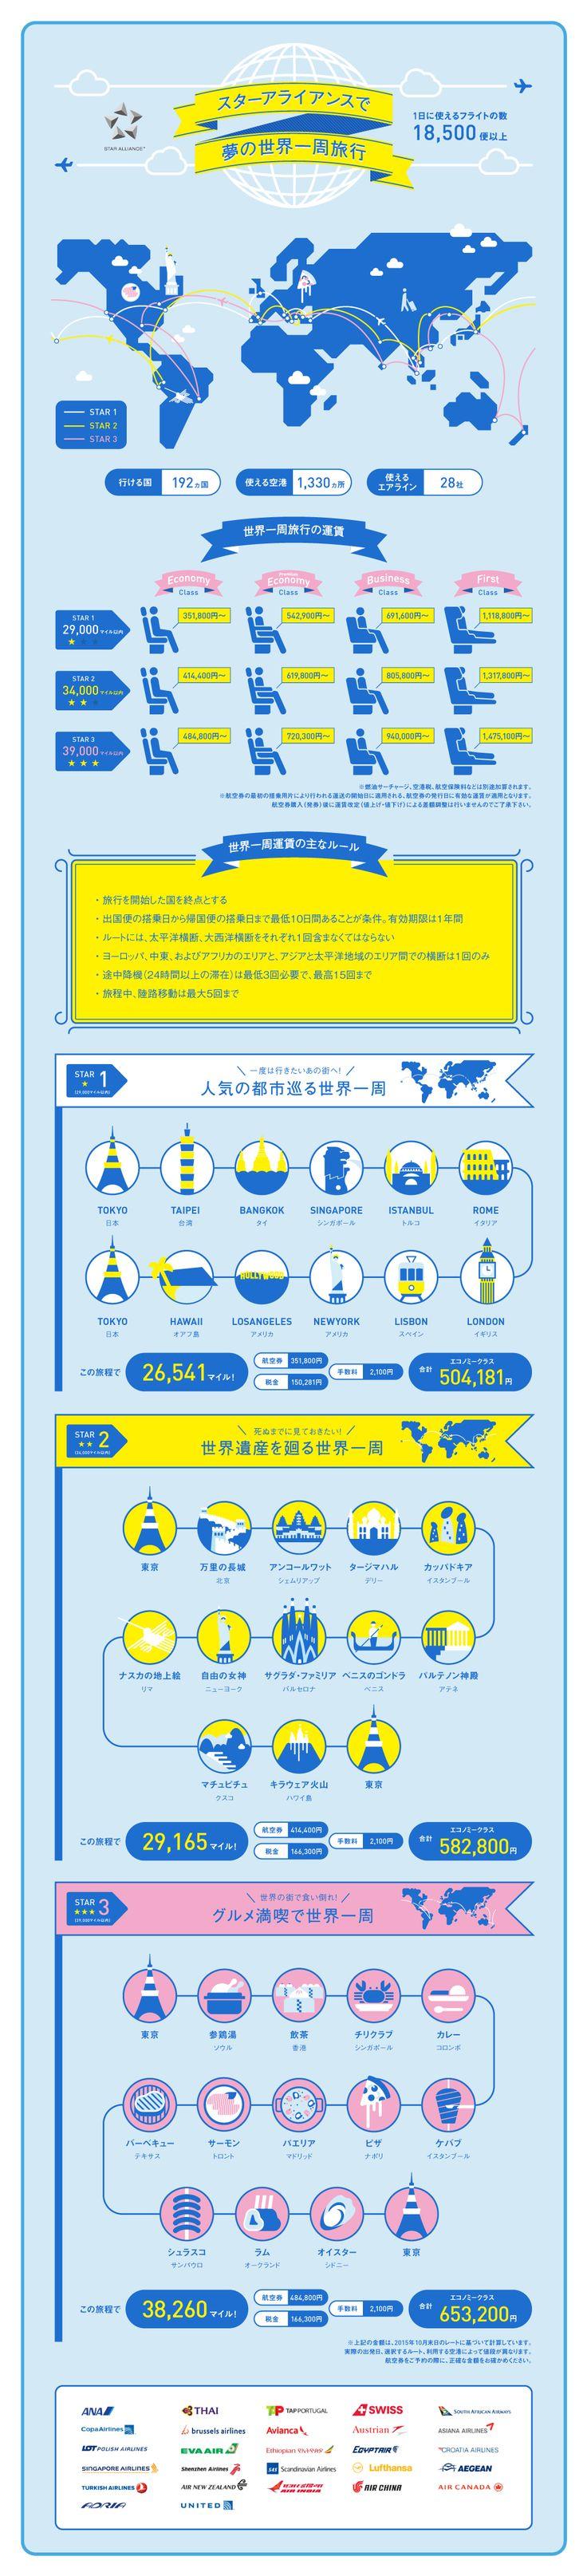 http://www.ana.co.jp/travelandlife/infographics/vol07/